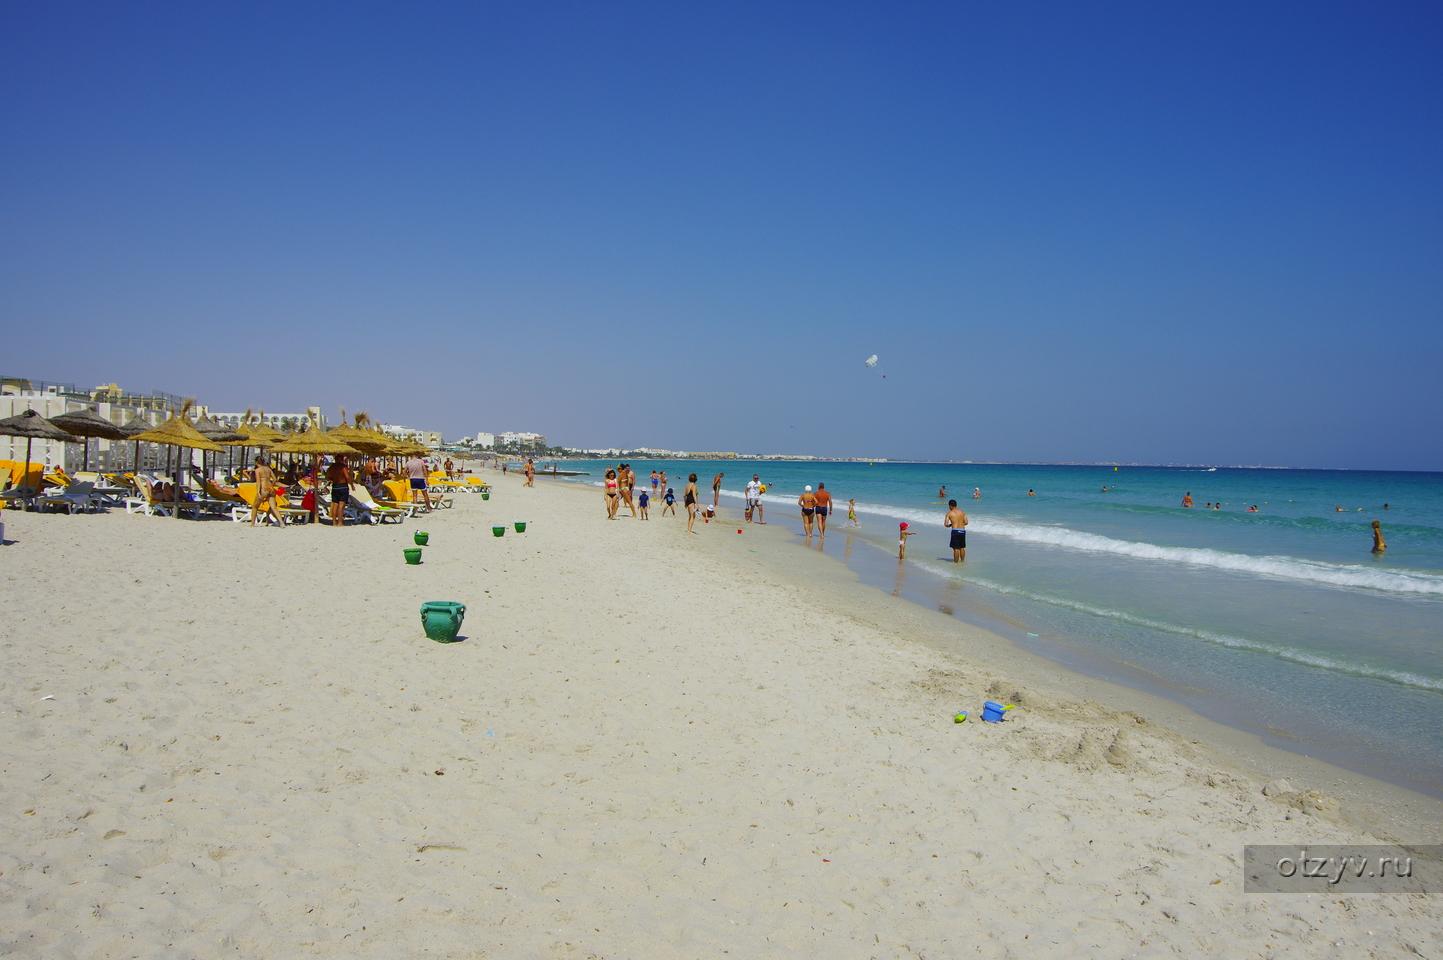 Пляжи махдии в тунисе фото